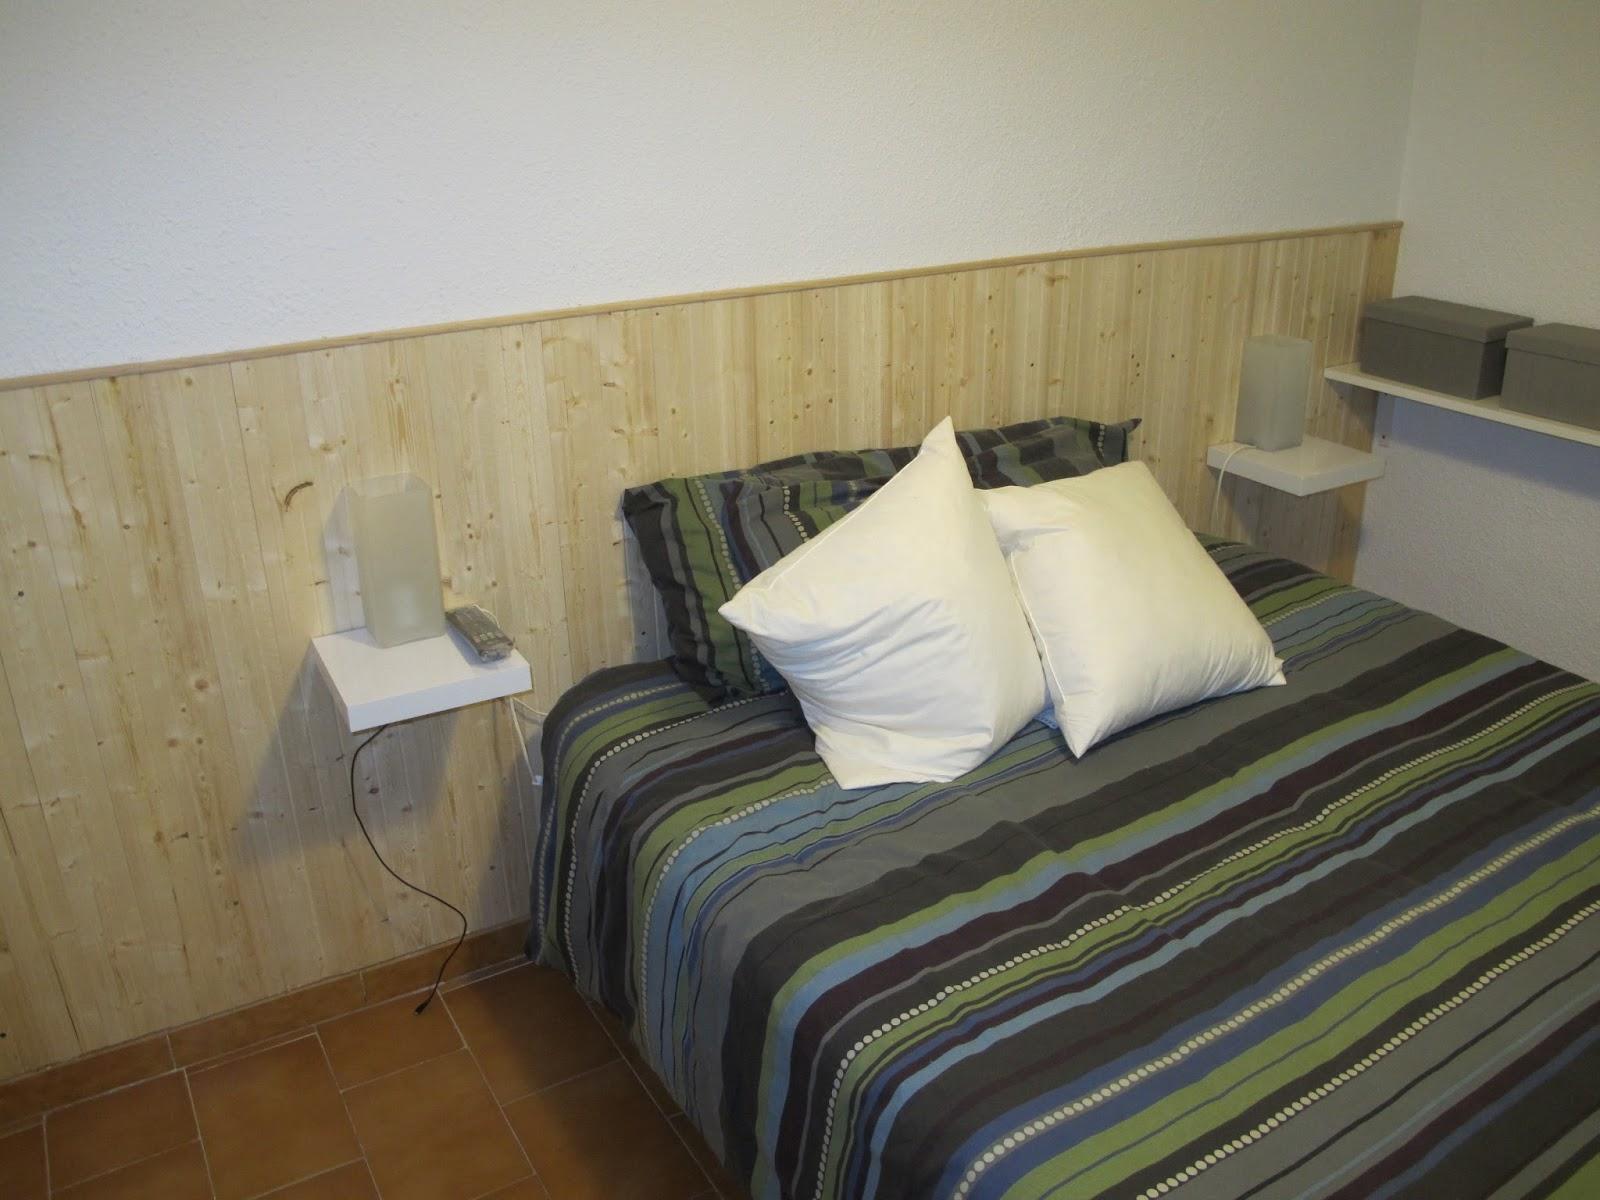 Bricomonxo cabecero de madera para dormitorio - Cabecero con laminas de madera ...